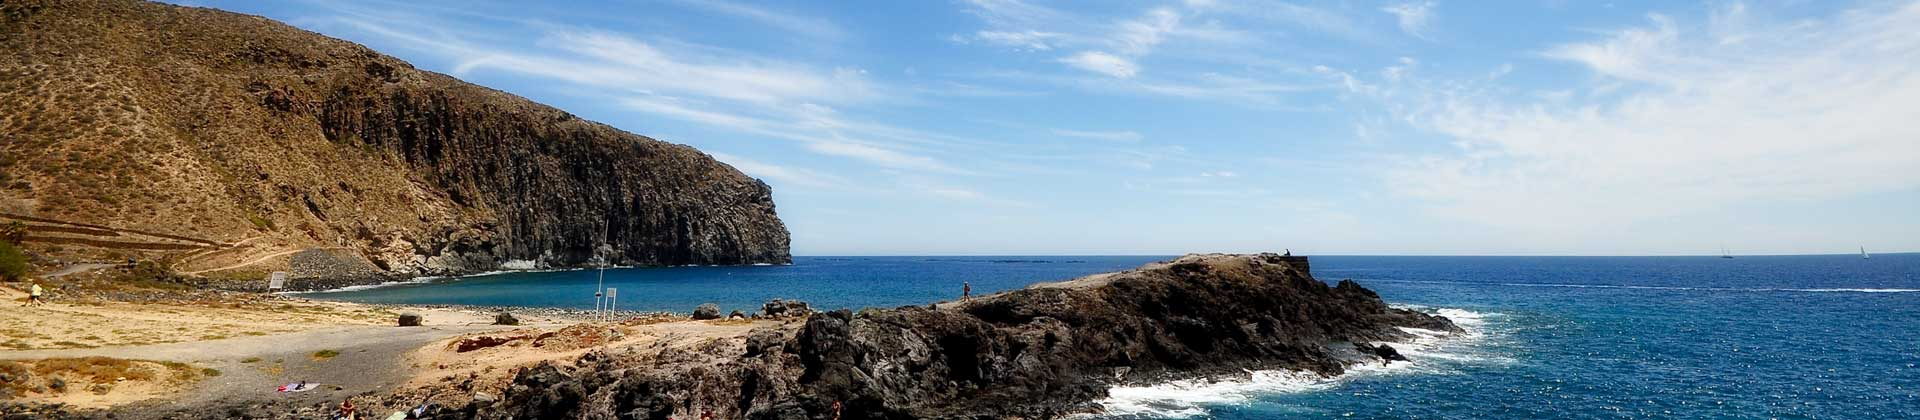 https://www.goodmorningtenerife.com/wp-content/uploads/2014/08/03_slide_landscape_GM_Tenerife.jpg